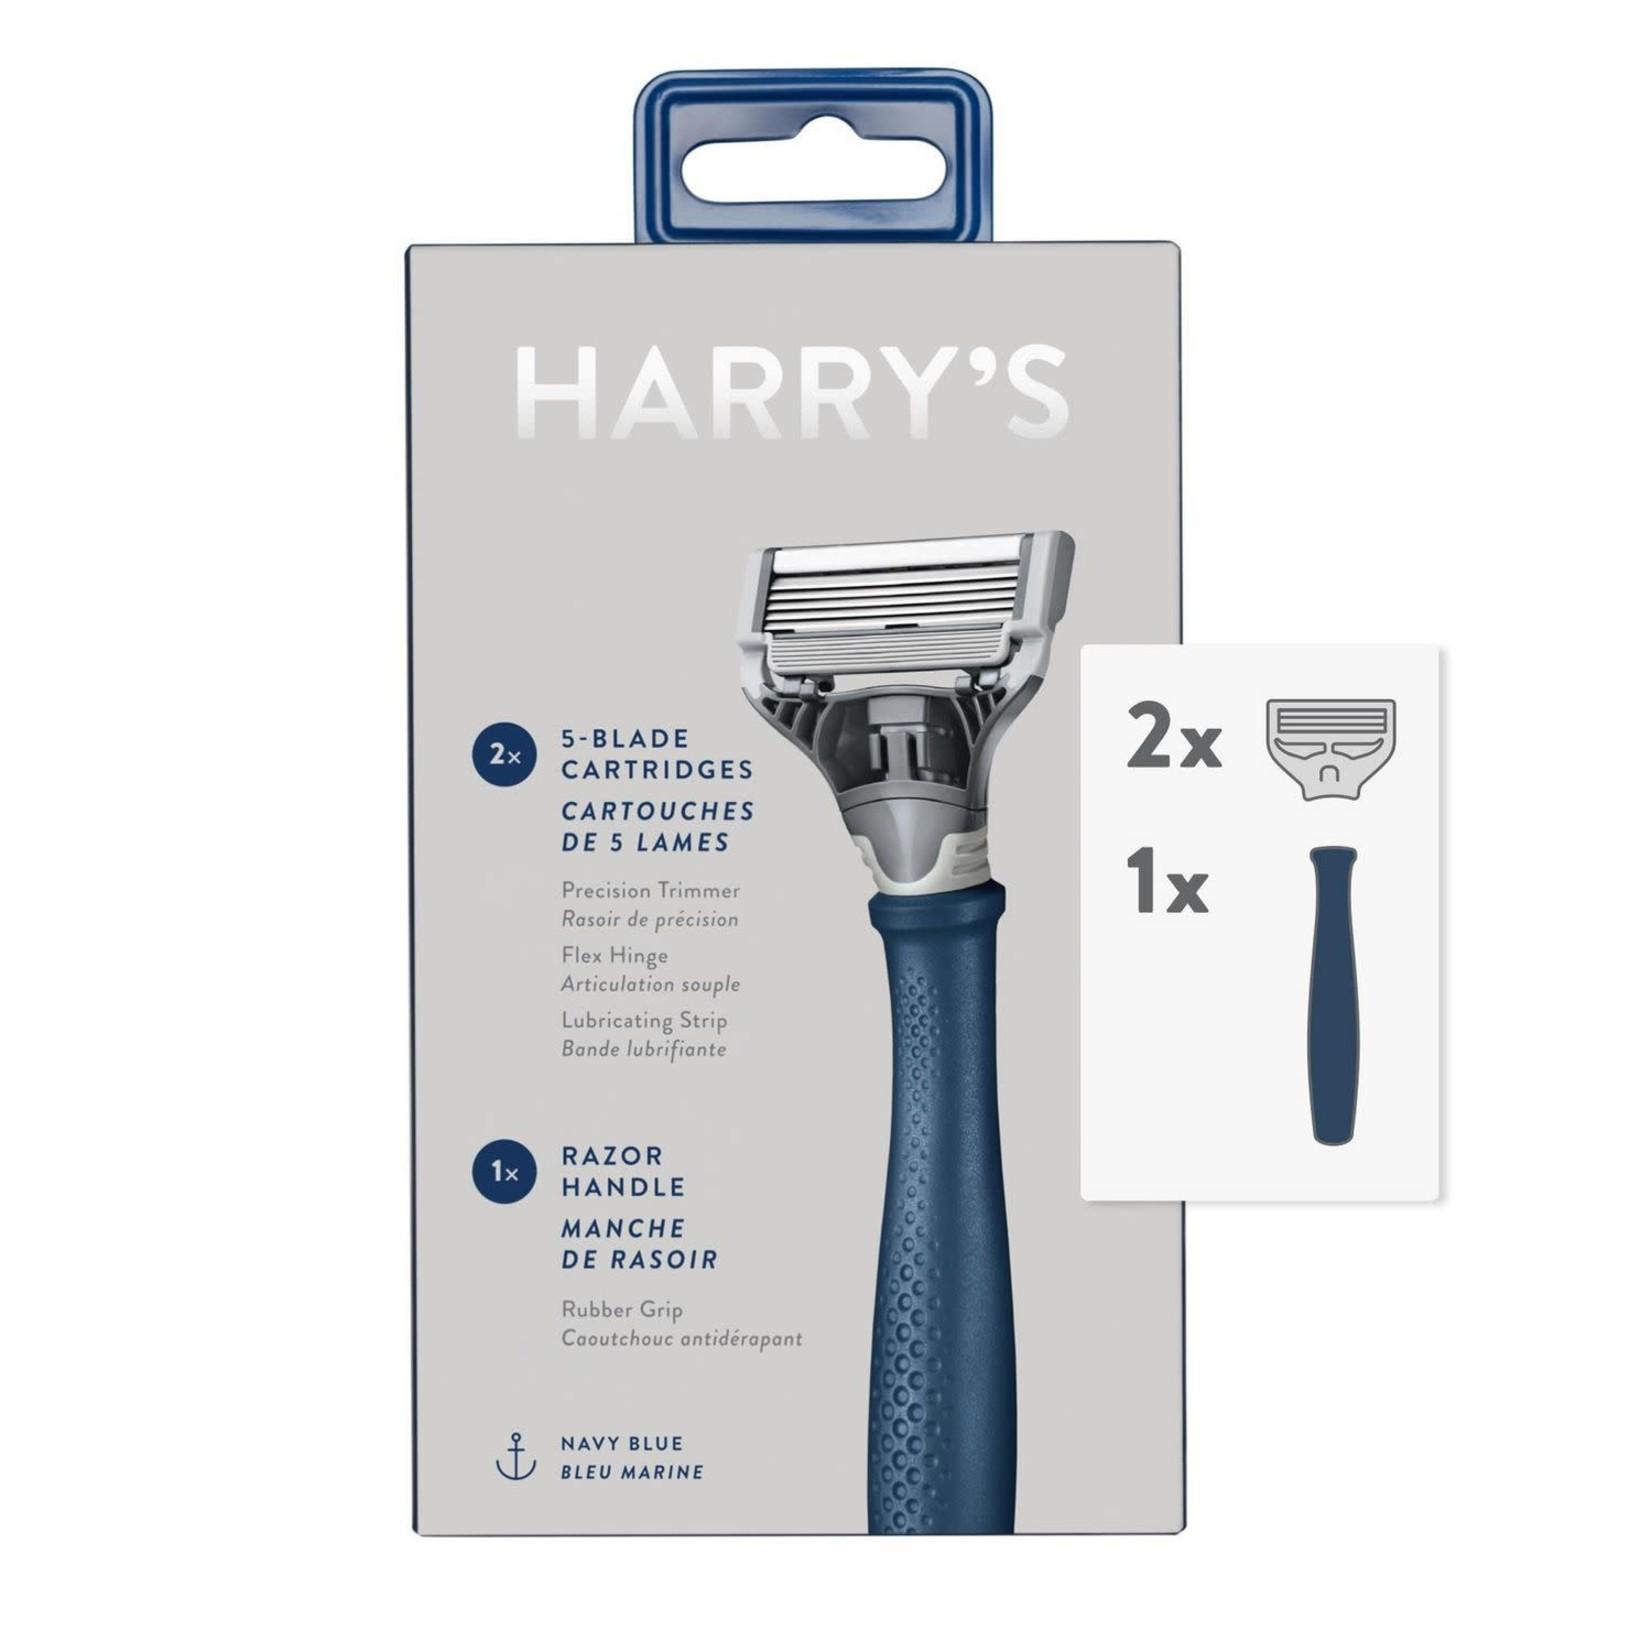 Harry's 5-Blade Men's Razor – 1 Razor Handle + 2 Razor Blade Refills